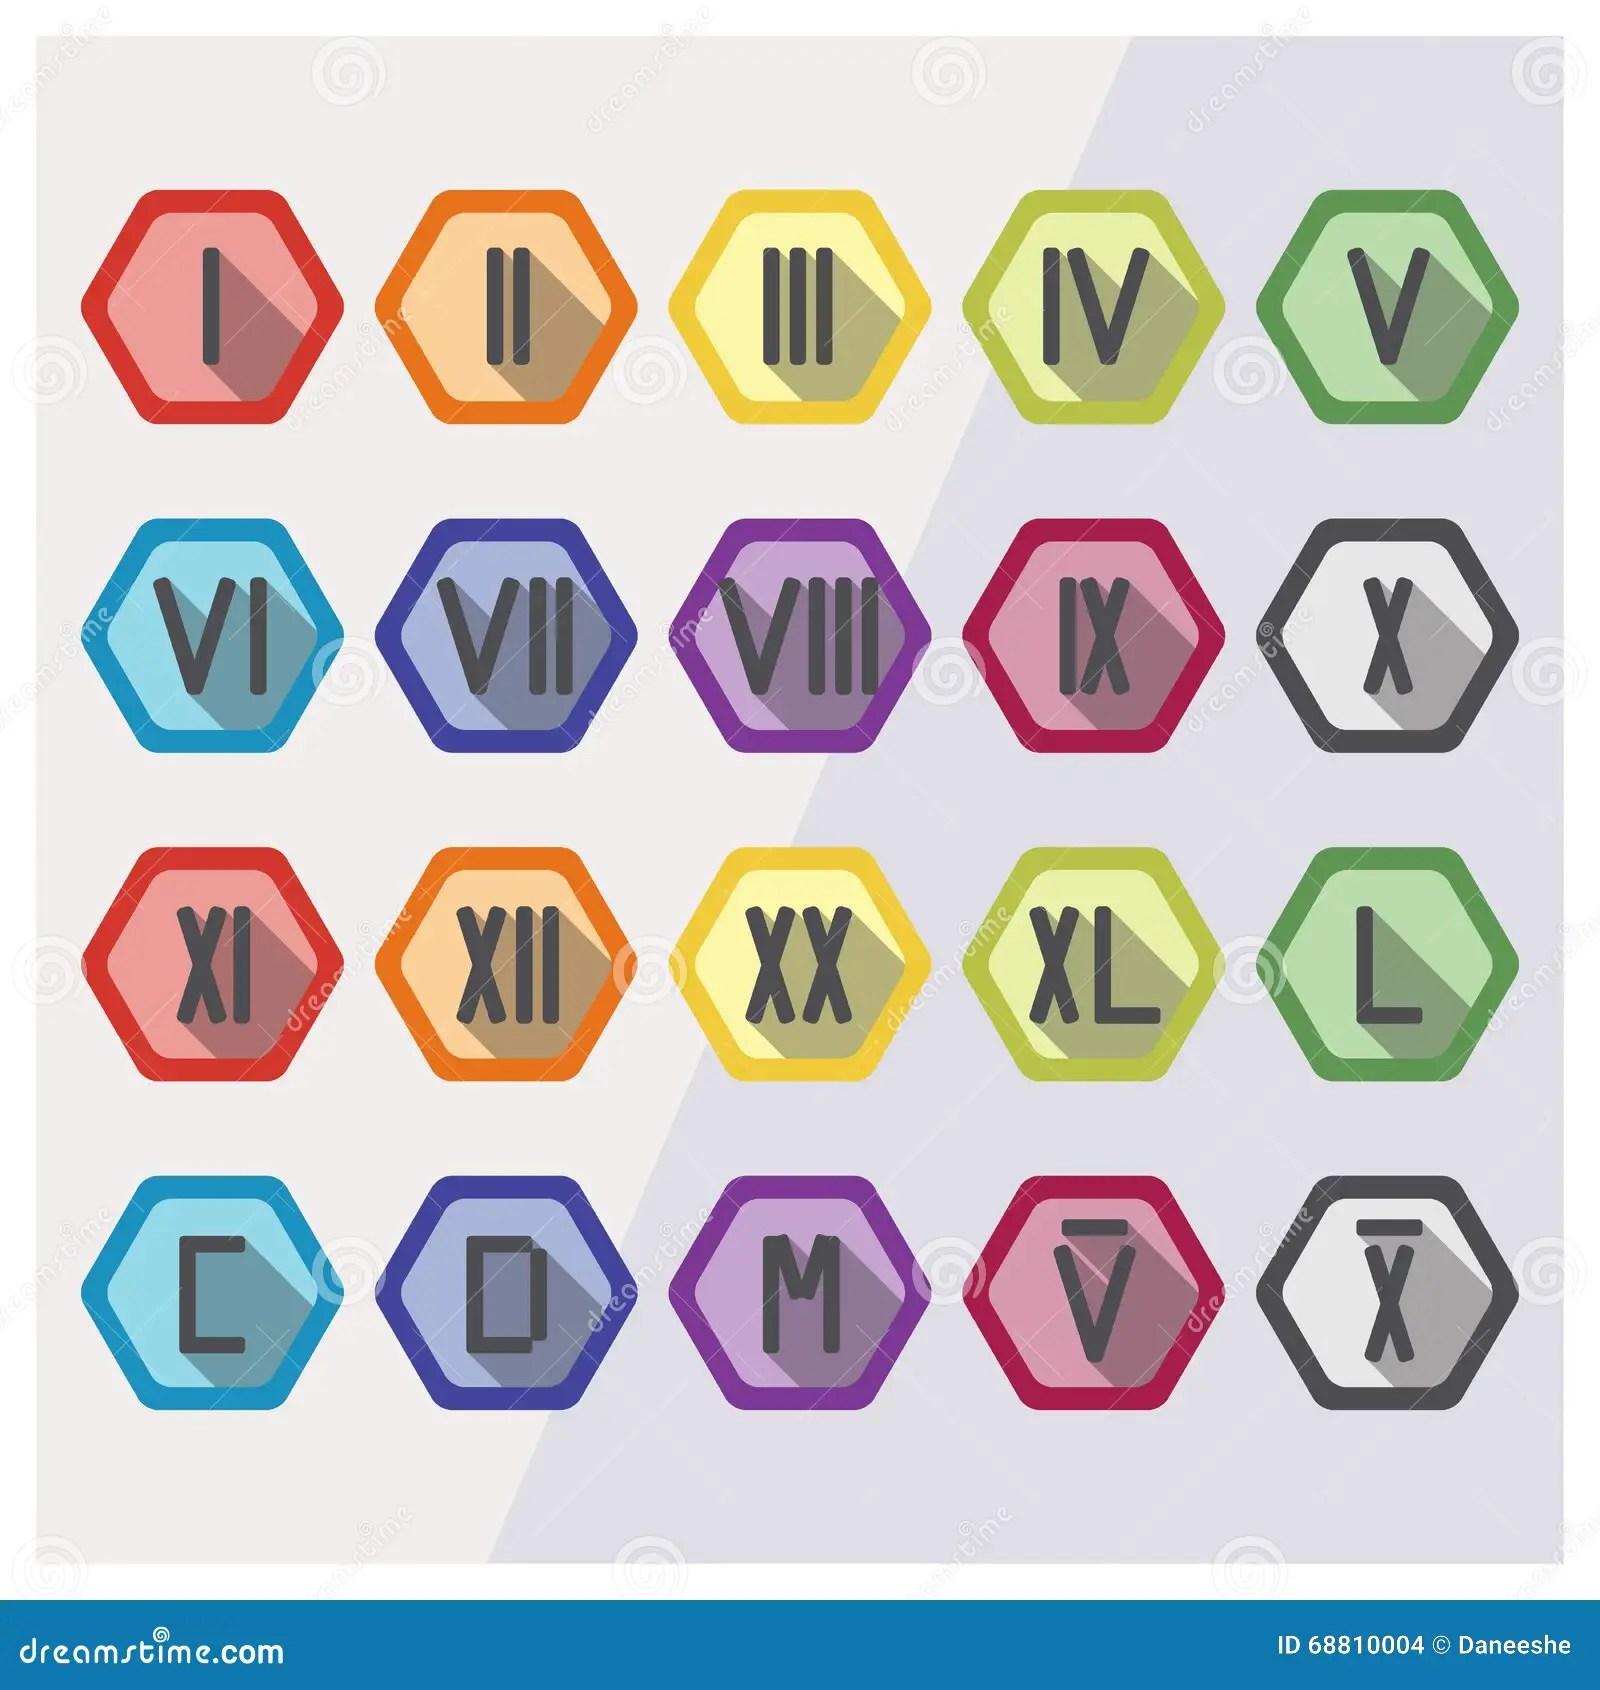 Search Results For 1 100 In Roman Numerals Calendar